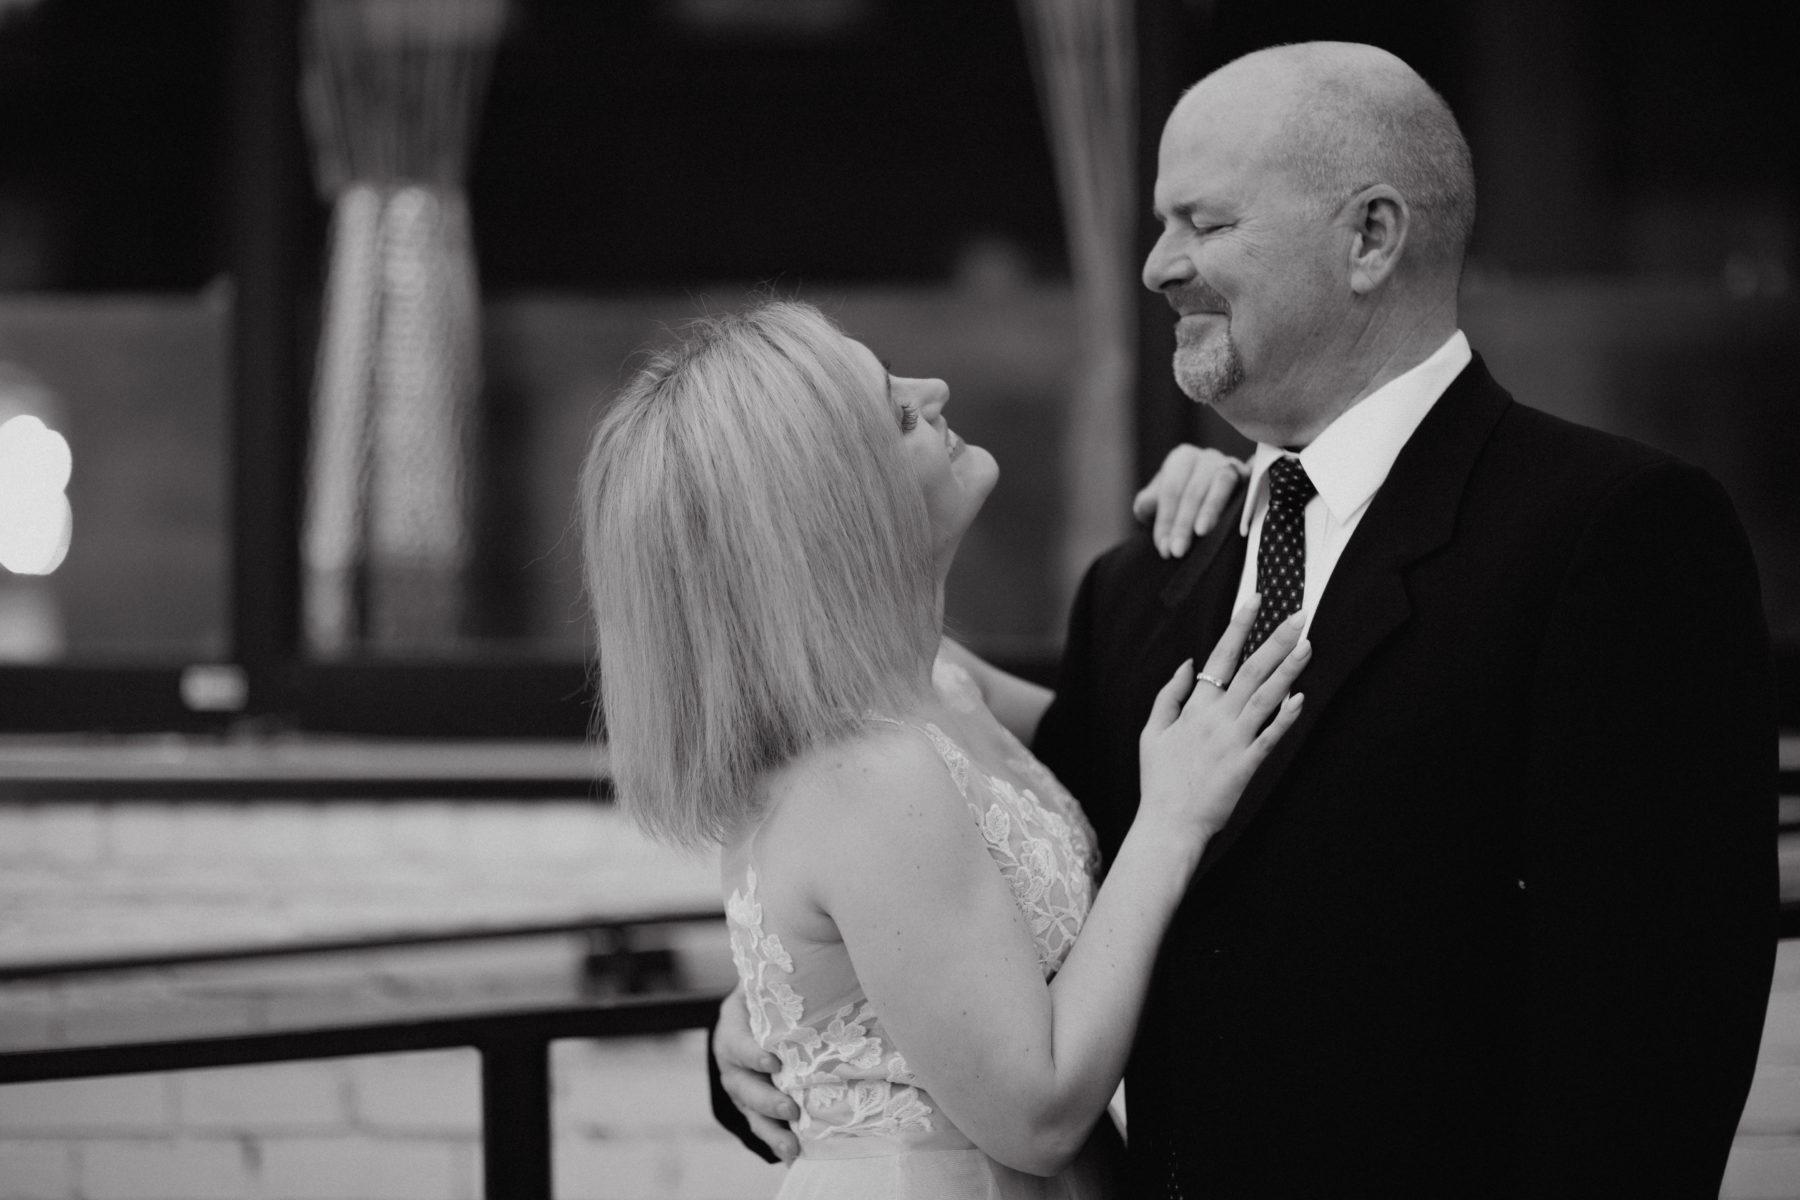 Father daughter wedding photos: Nashville brunch elopement featured on Nashville Bride Guide